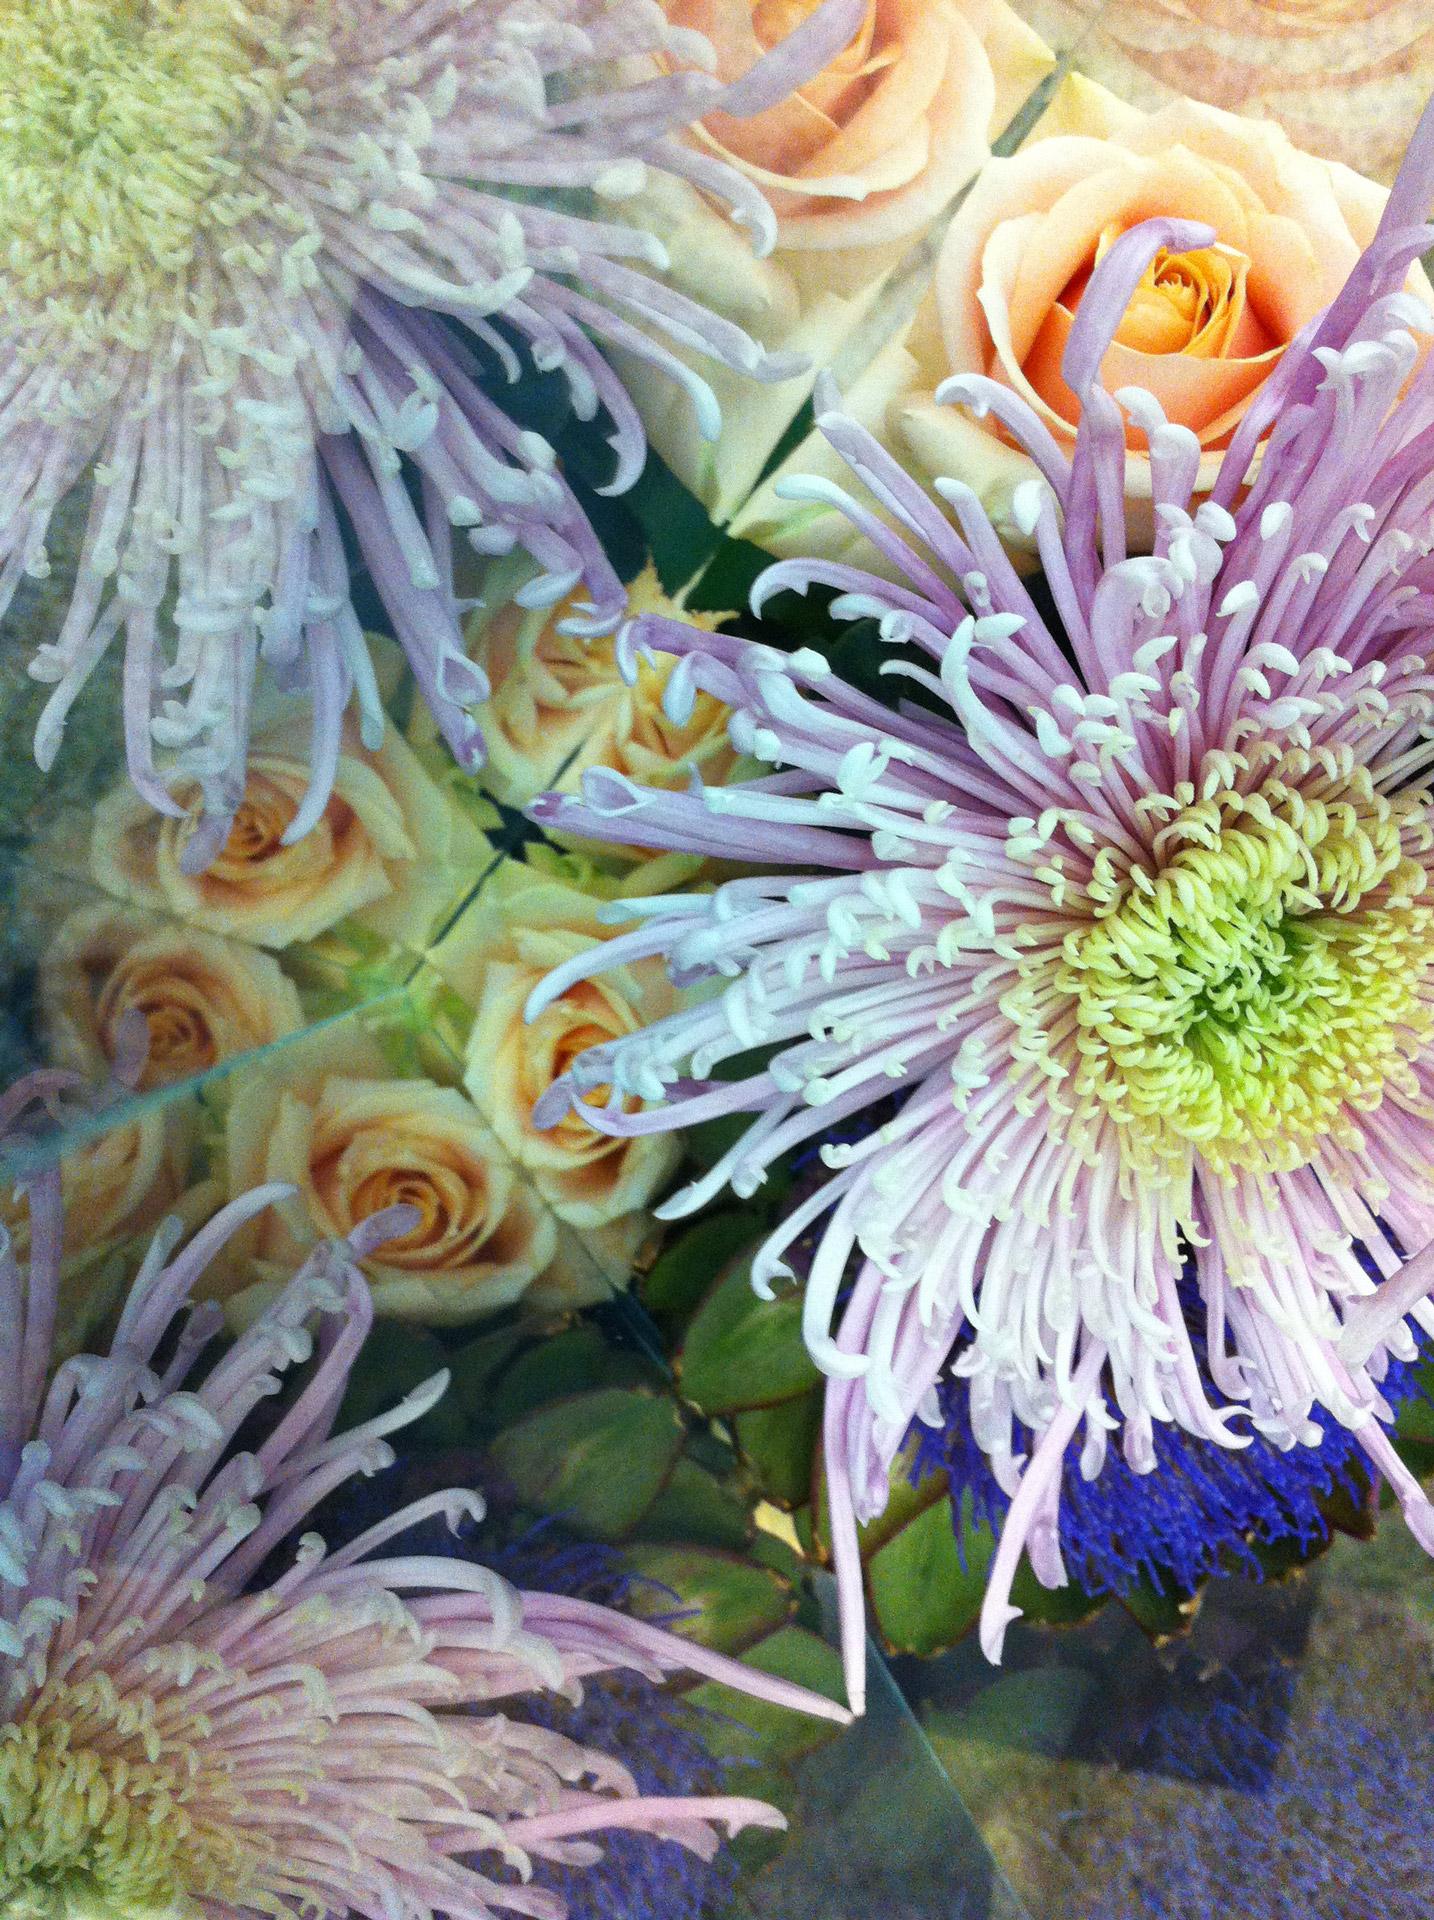 Tino Seubert - Narcissus Vases - Inside Detail